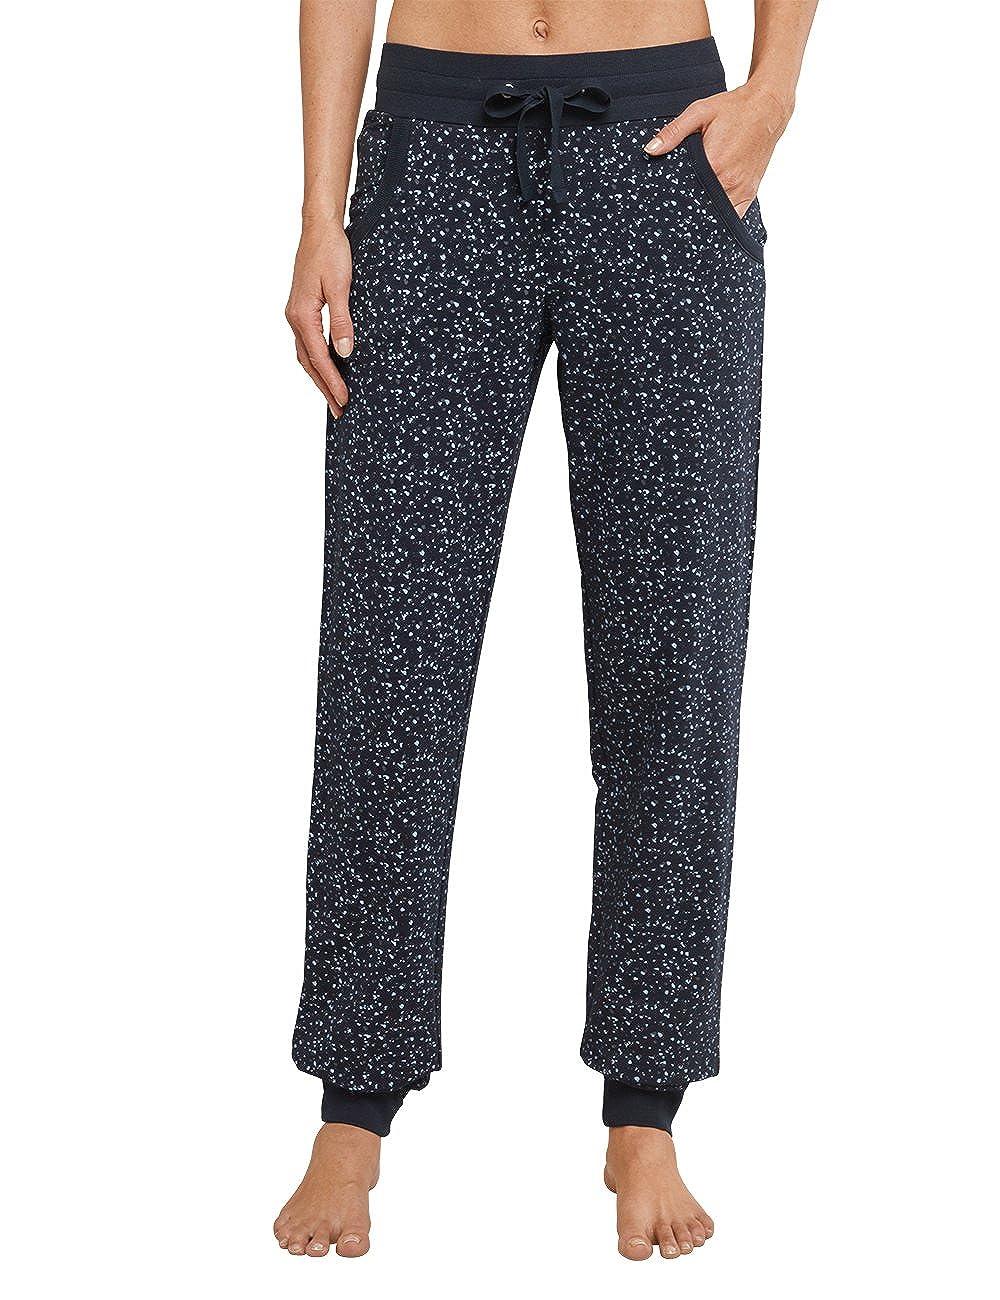 Schiesser Sweathose Lang, Pantalones de Pijama para Mujer